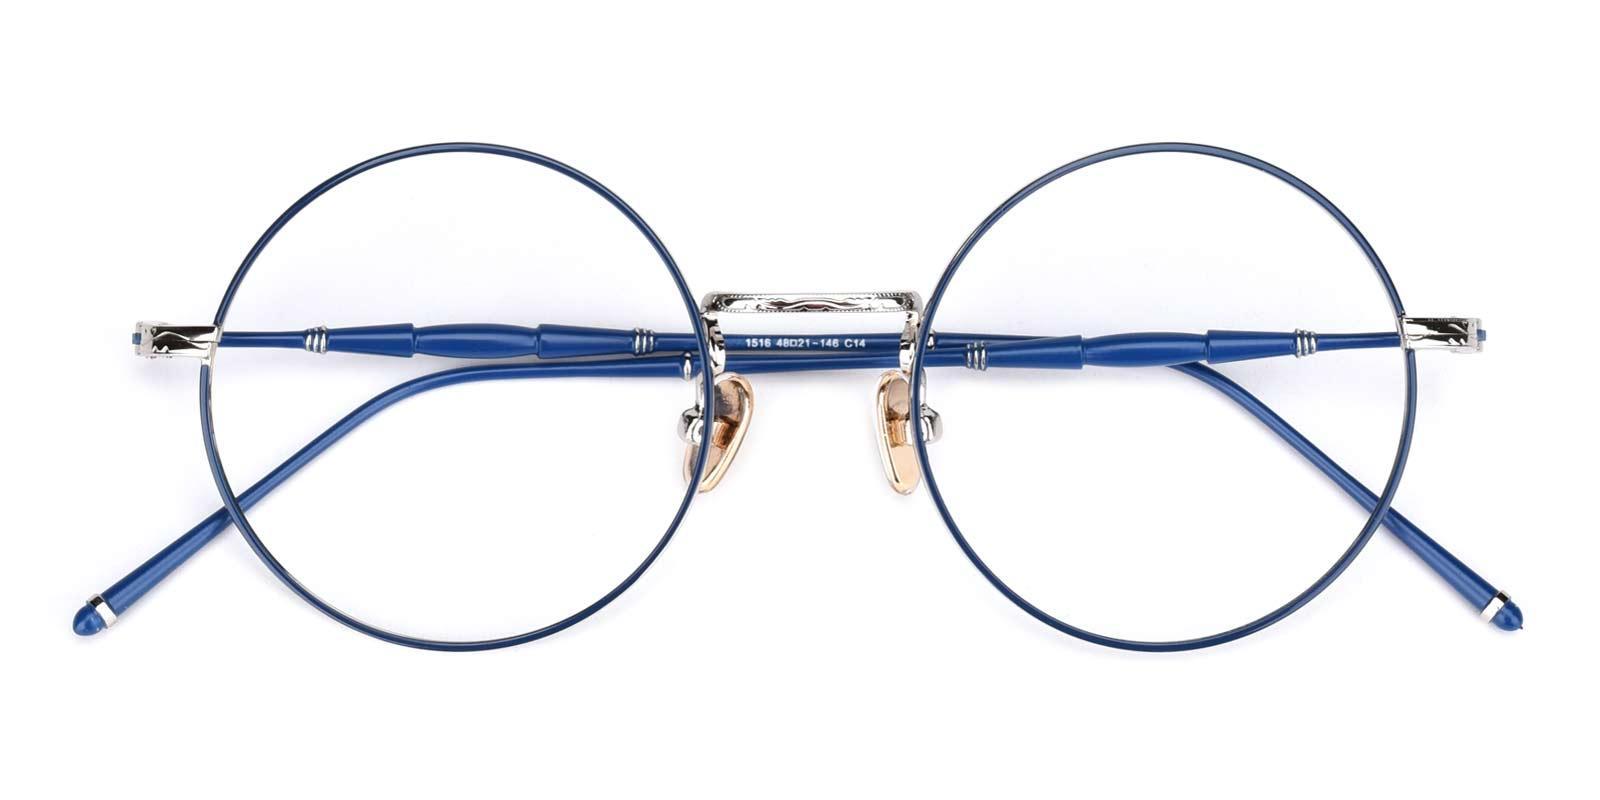 Toto-Blue-Round-Metal-Eyeglasses-detail